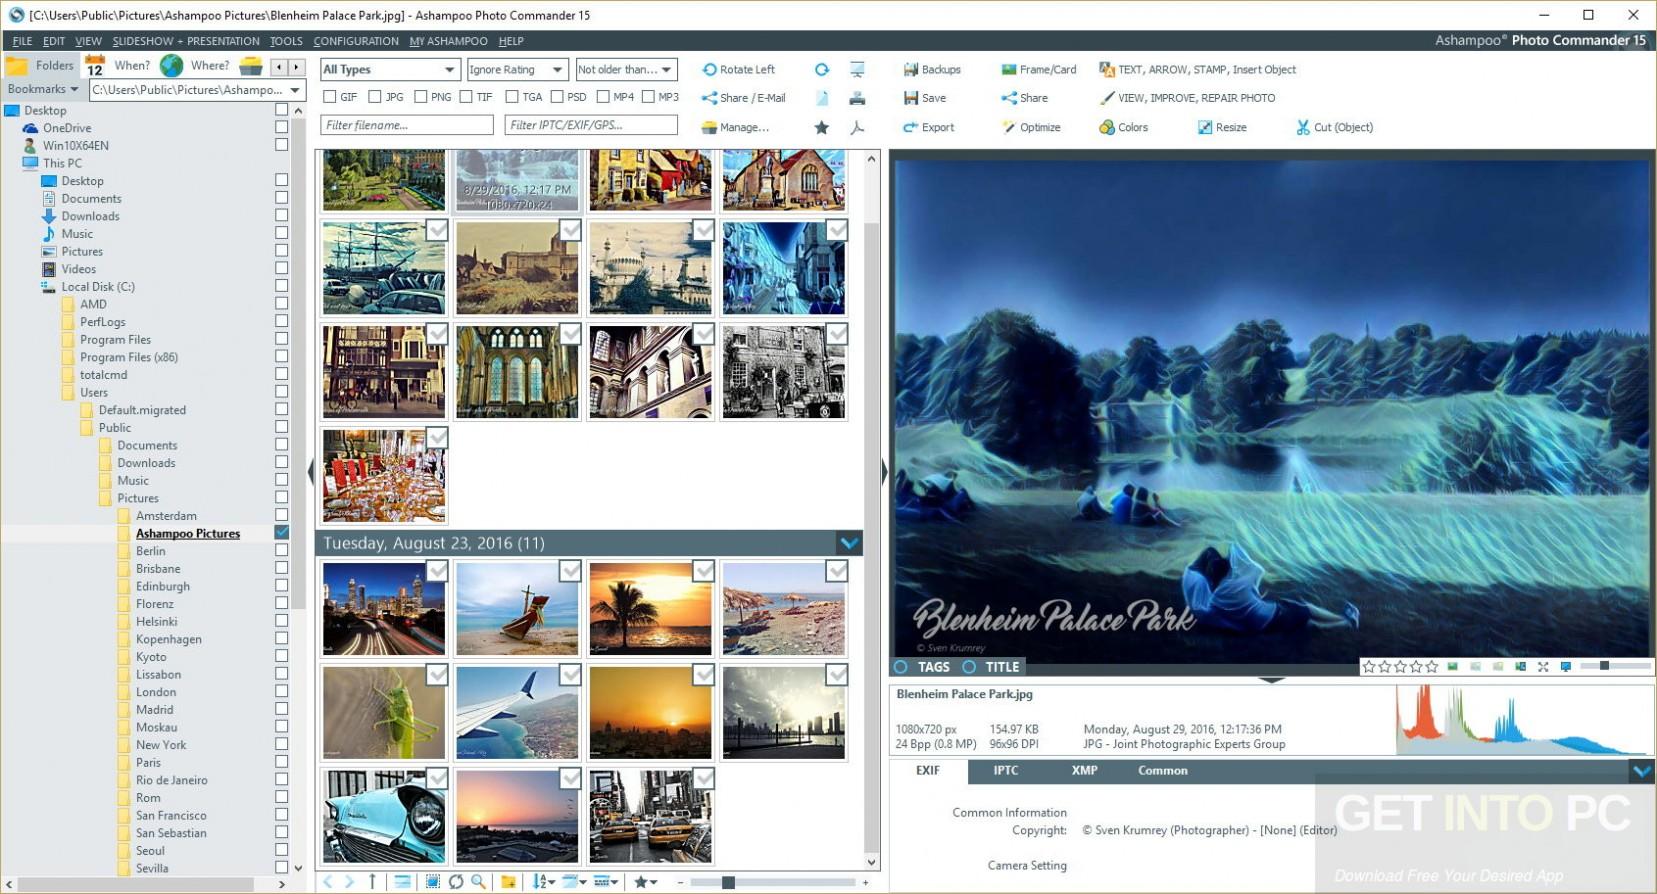 Ashampoo Photo Commander 15 Offline Installer Download